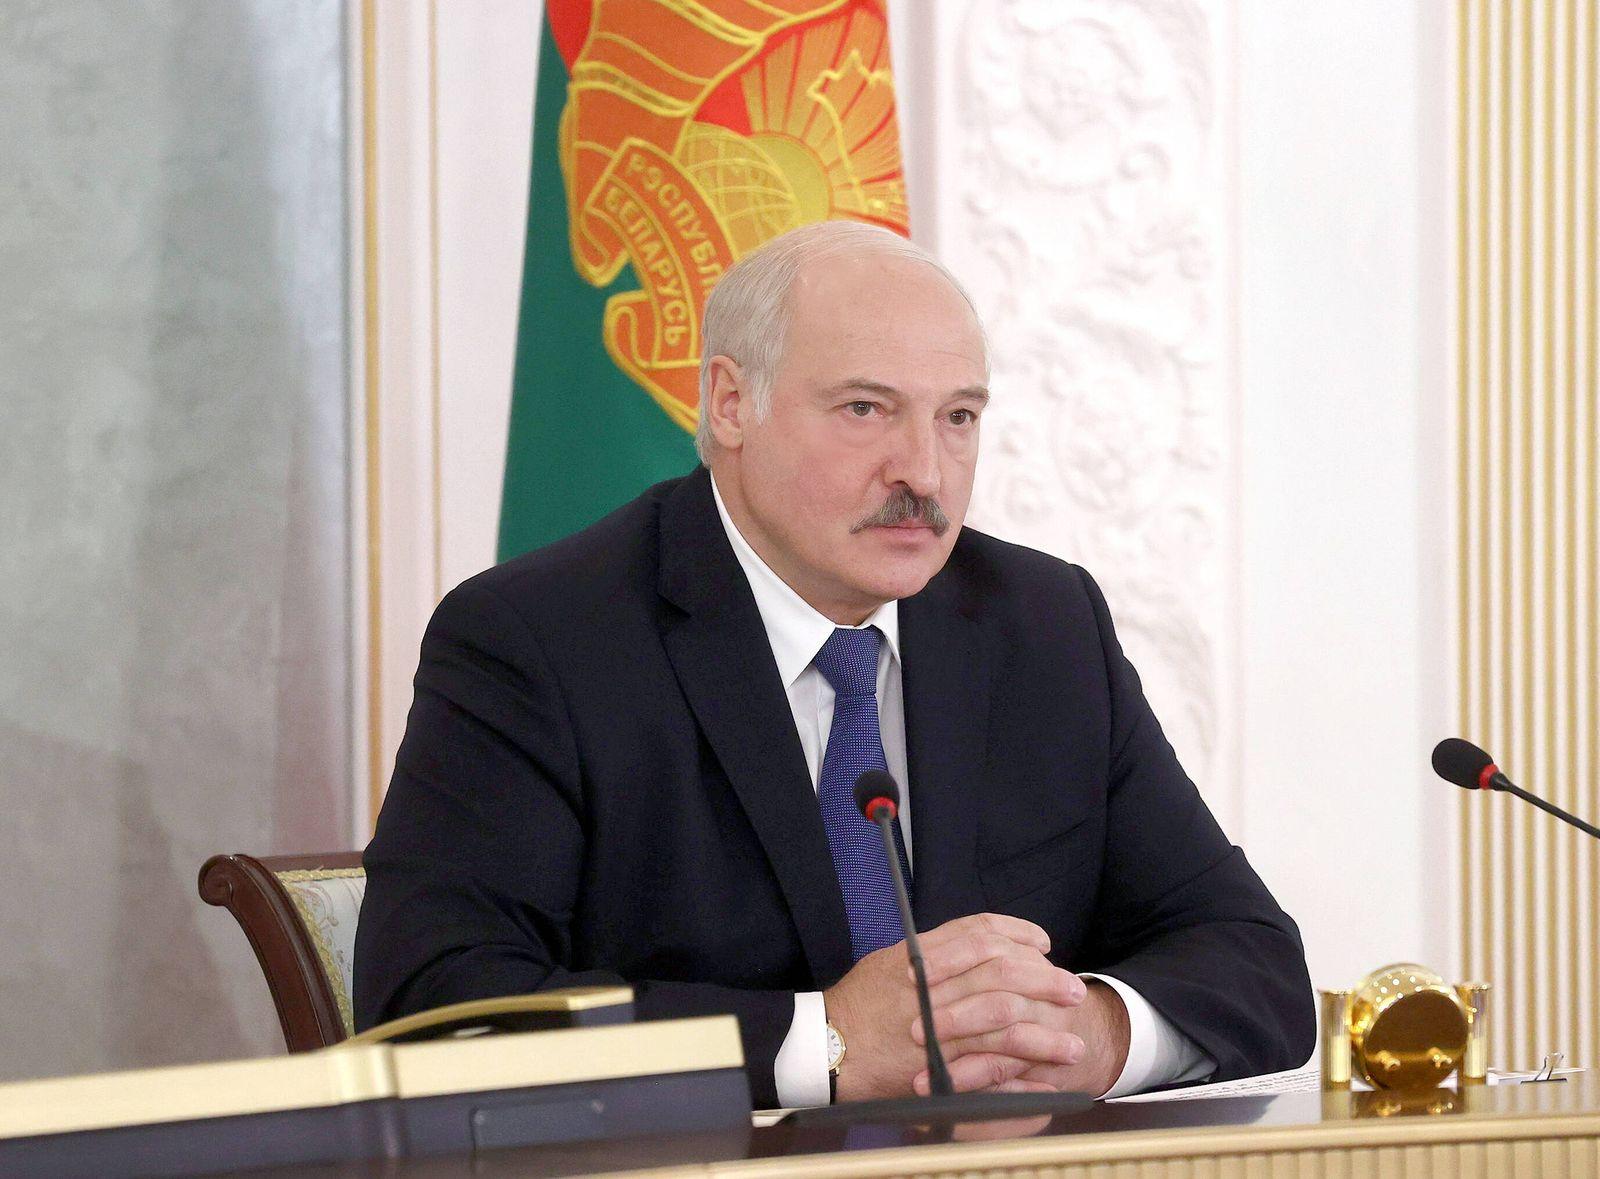 MINSK, BELARUS - JULY 1, 2021: Belarus President Alexander Lukashenko takes part in a plenary session of the 8th Forum